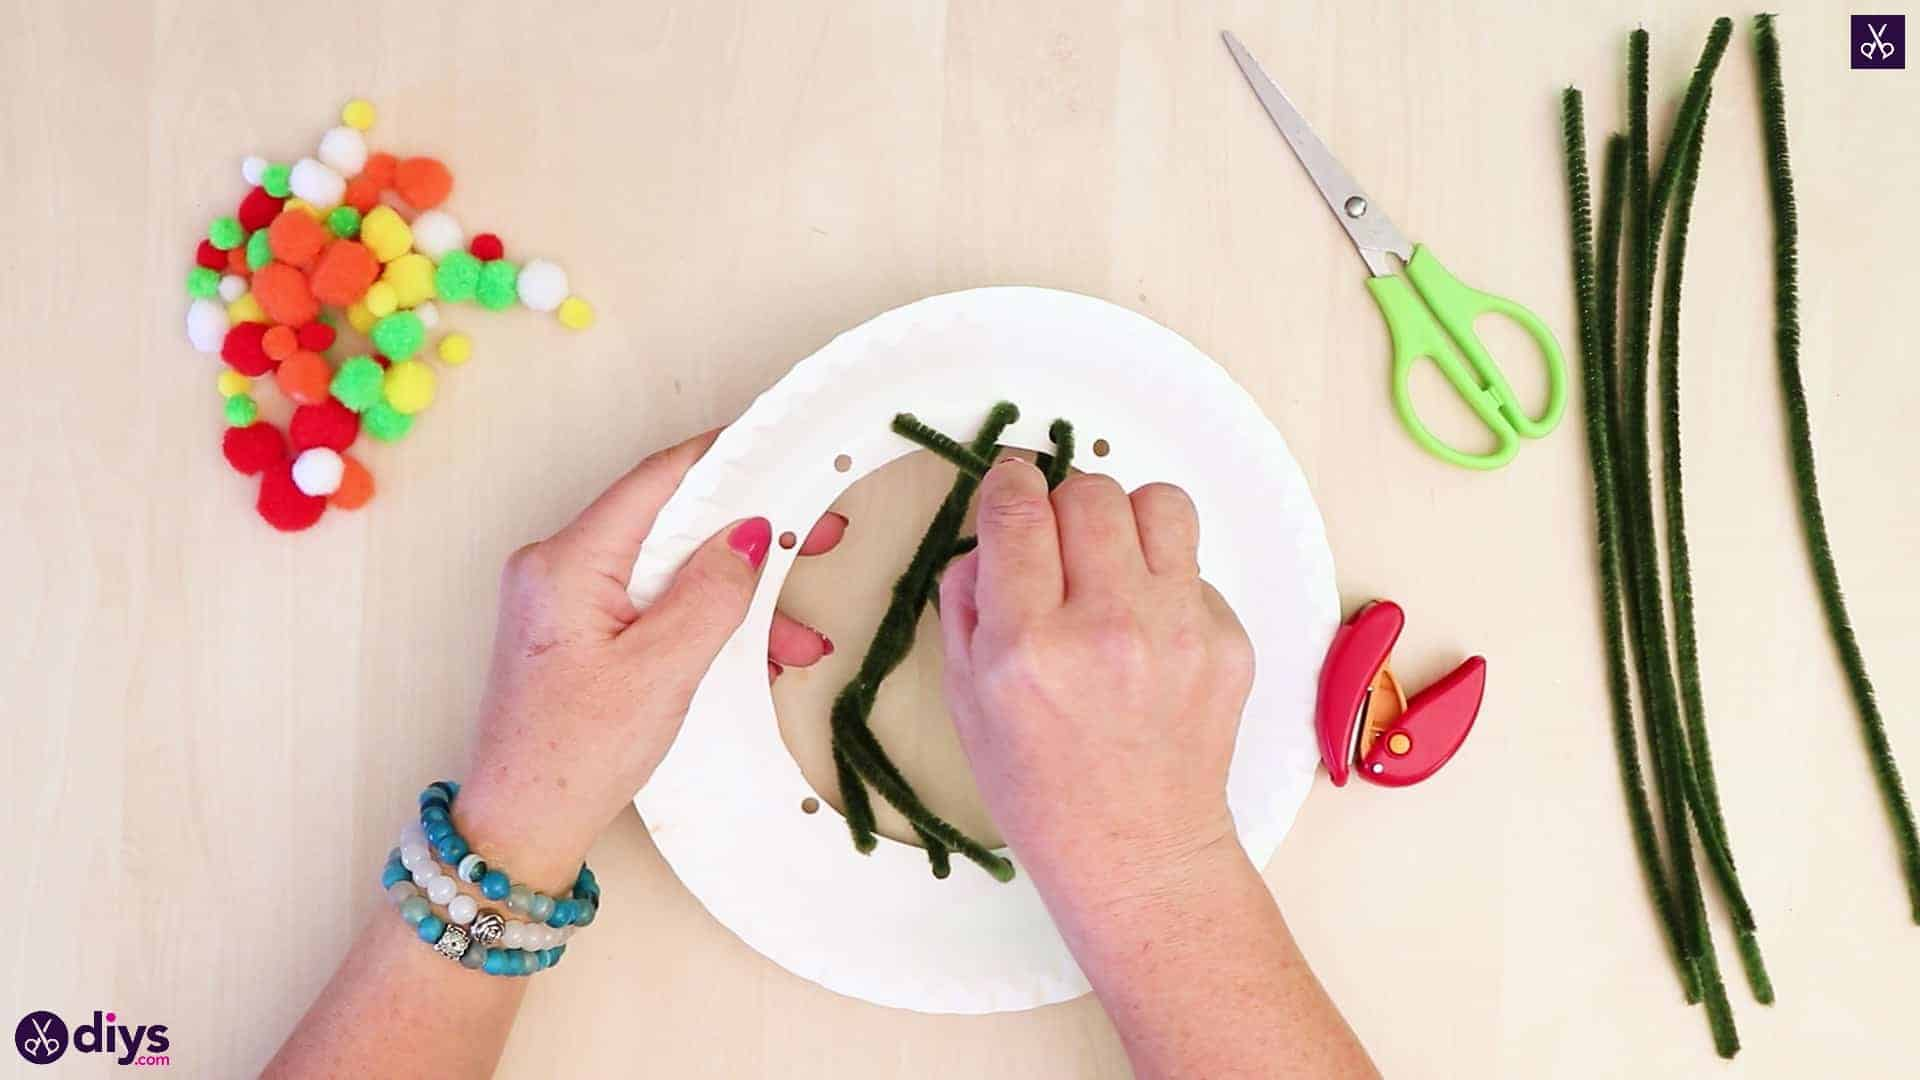 Diy paper plate tree art step 4d